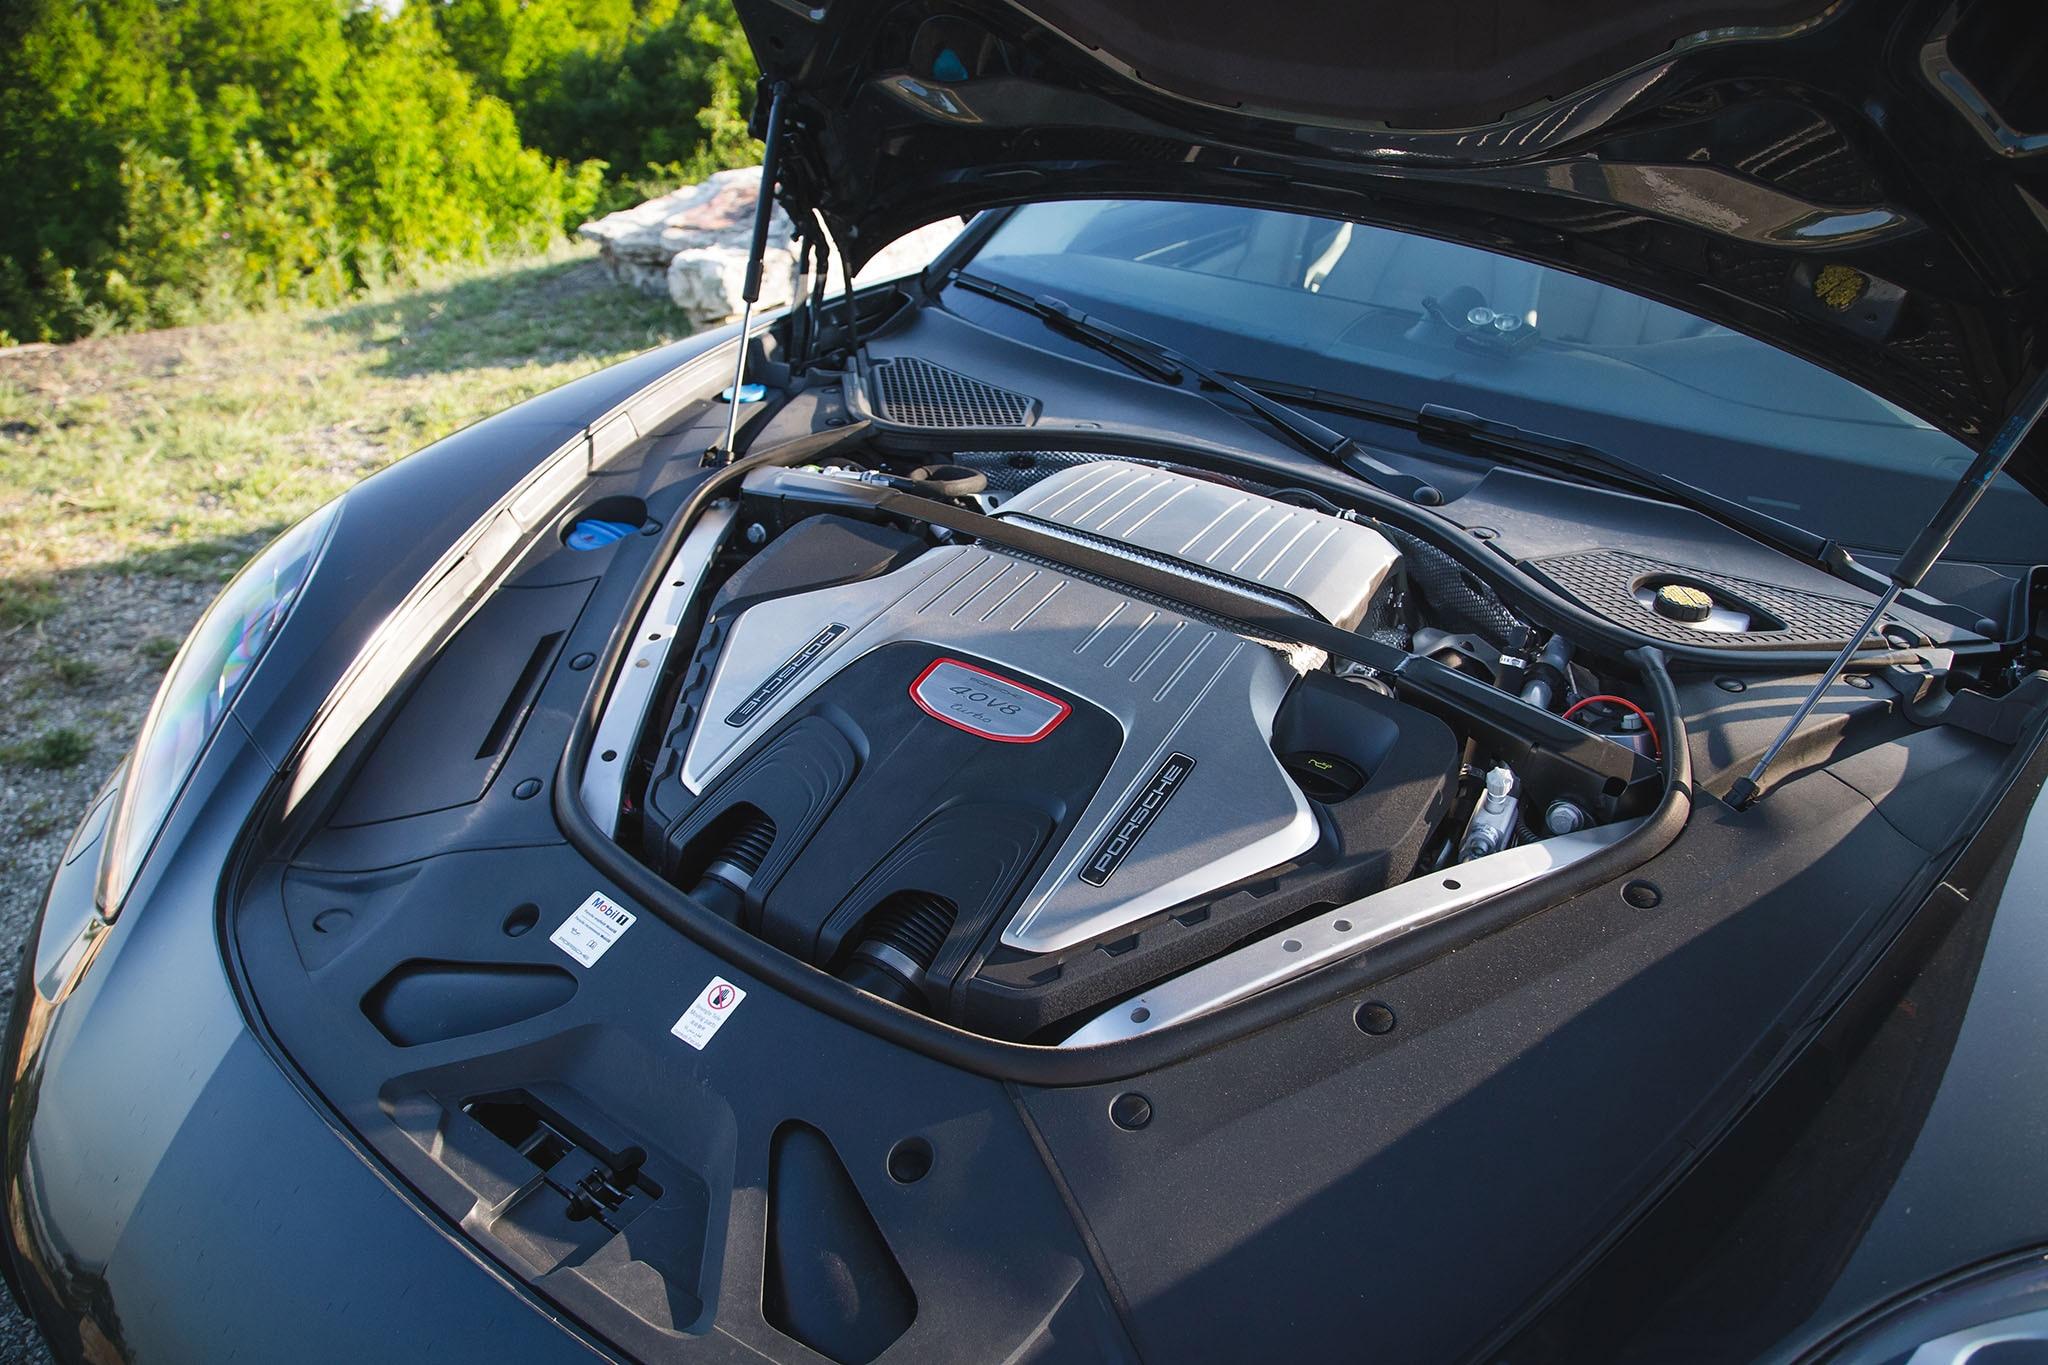 seven cool facts about the 2017 porsche panamera turbo automobile magazine